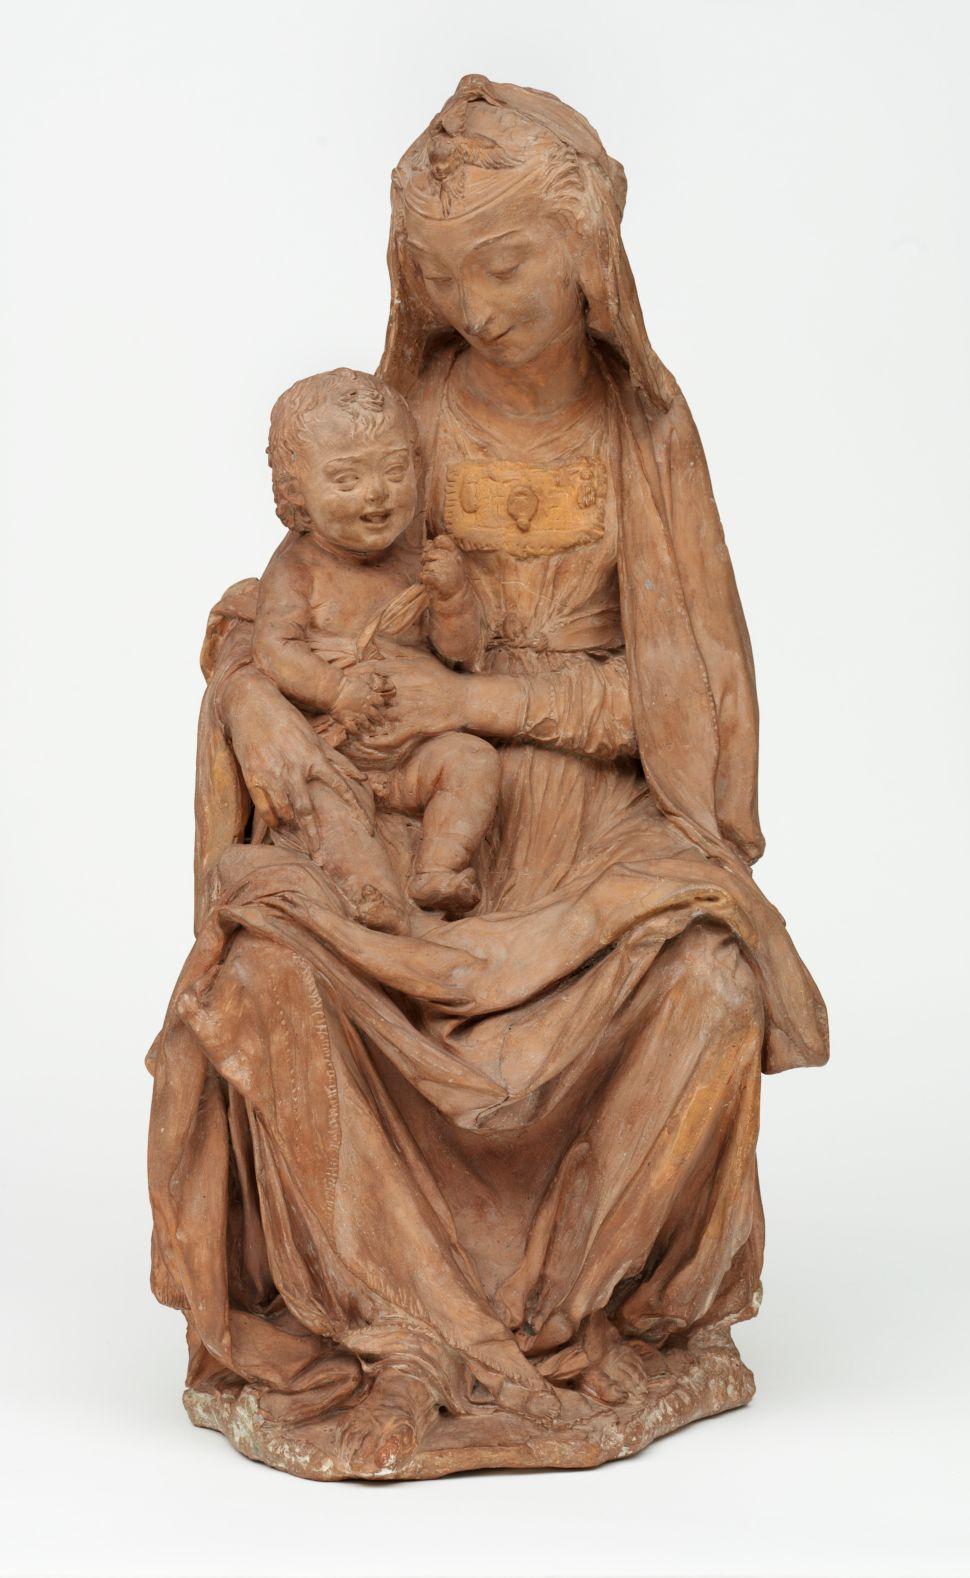 Is This Really Leonardo da Vinci's Only Surviving Sculpture?